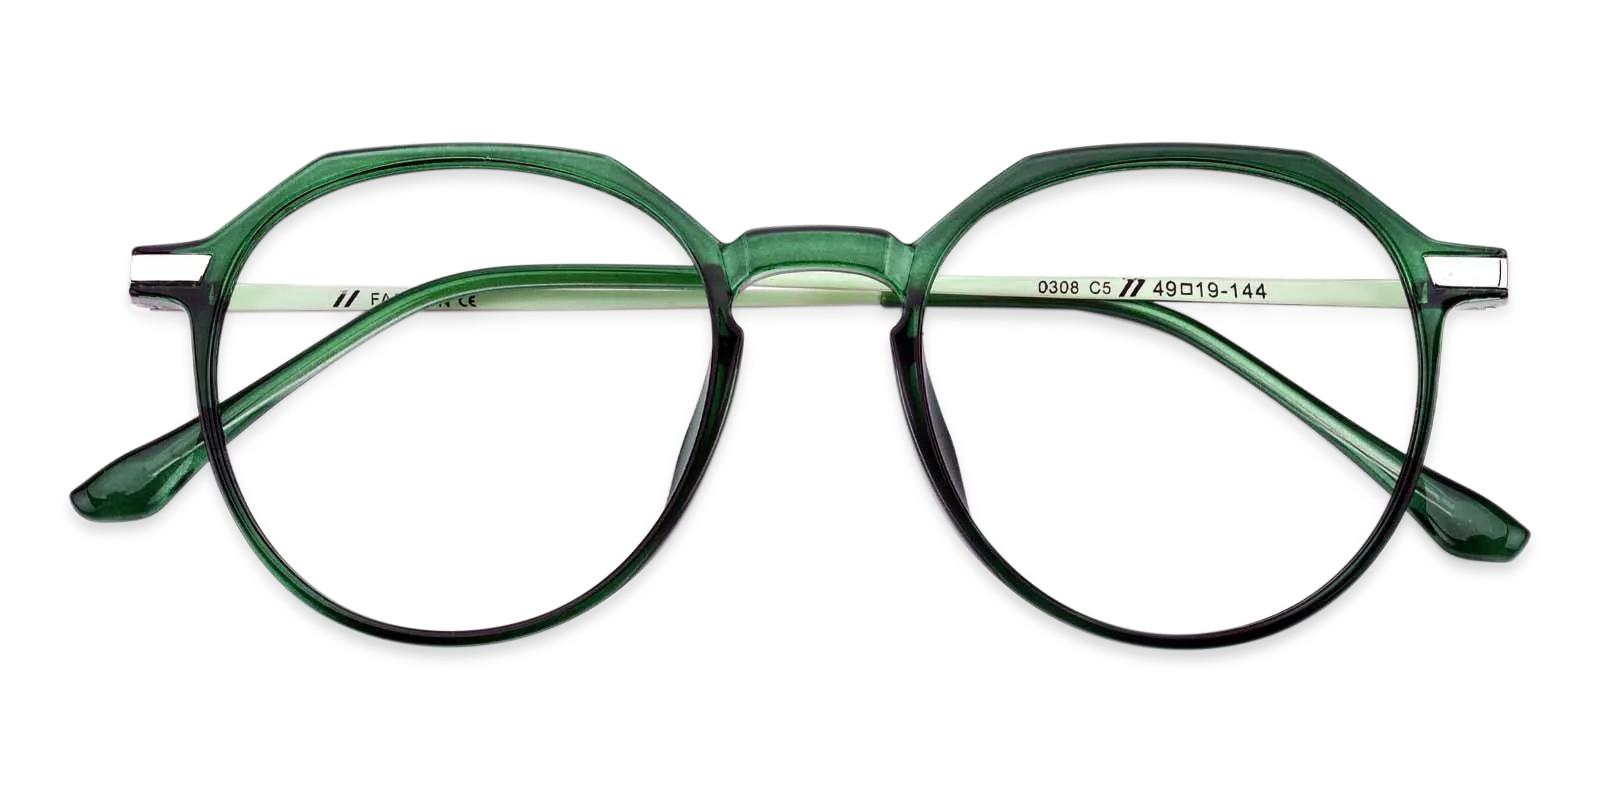 Hobbit Green Combination Eyeglasses , Fashion , UniversalBridgeFit Frames from ABBE Glasses